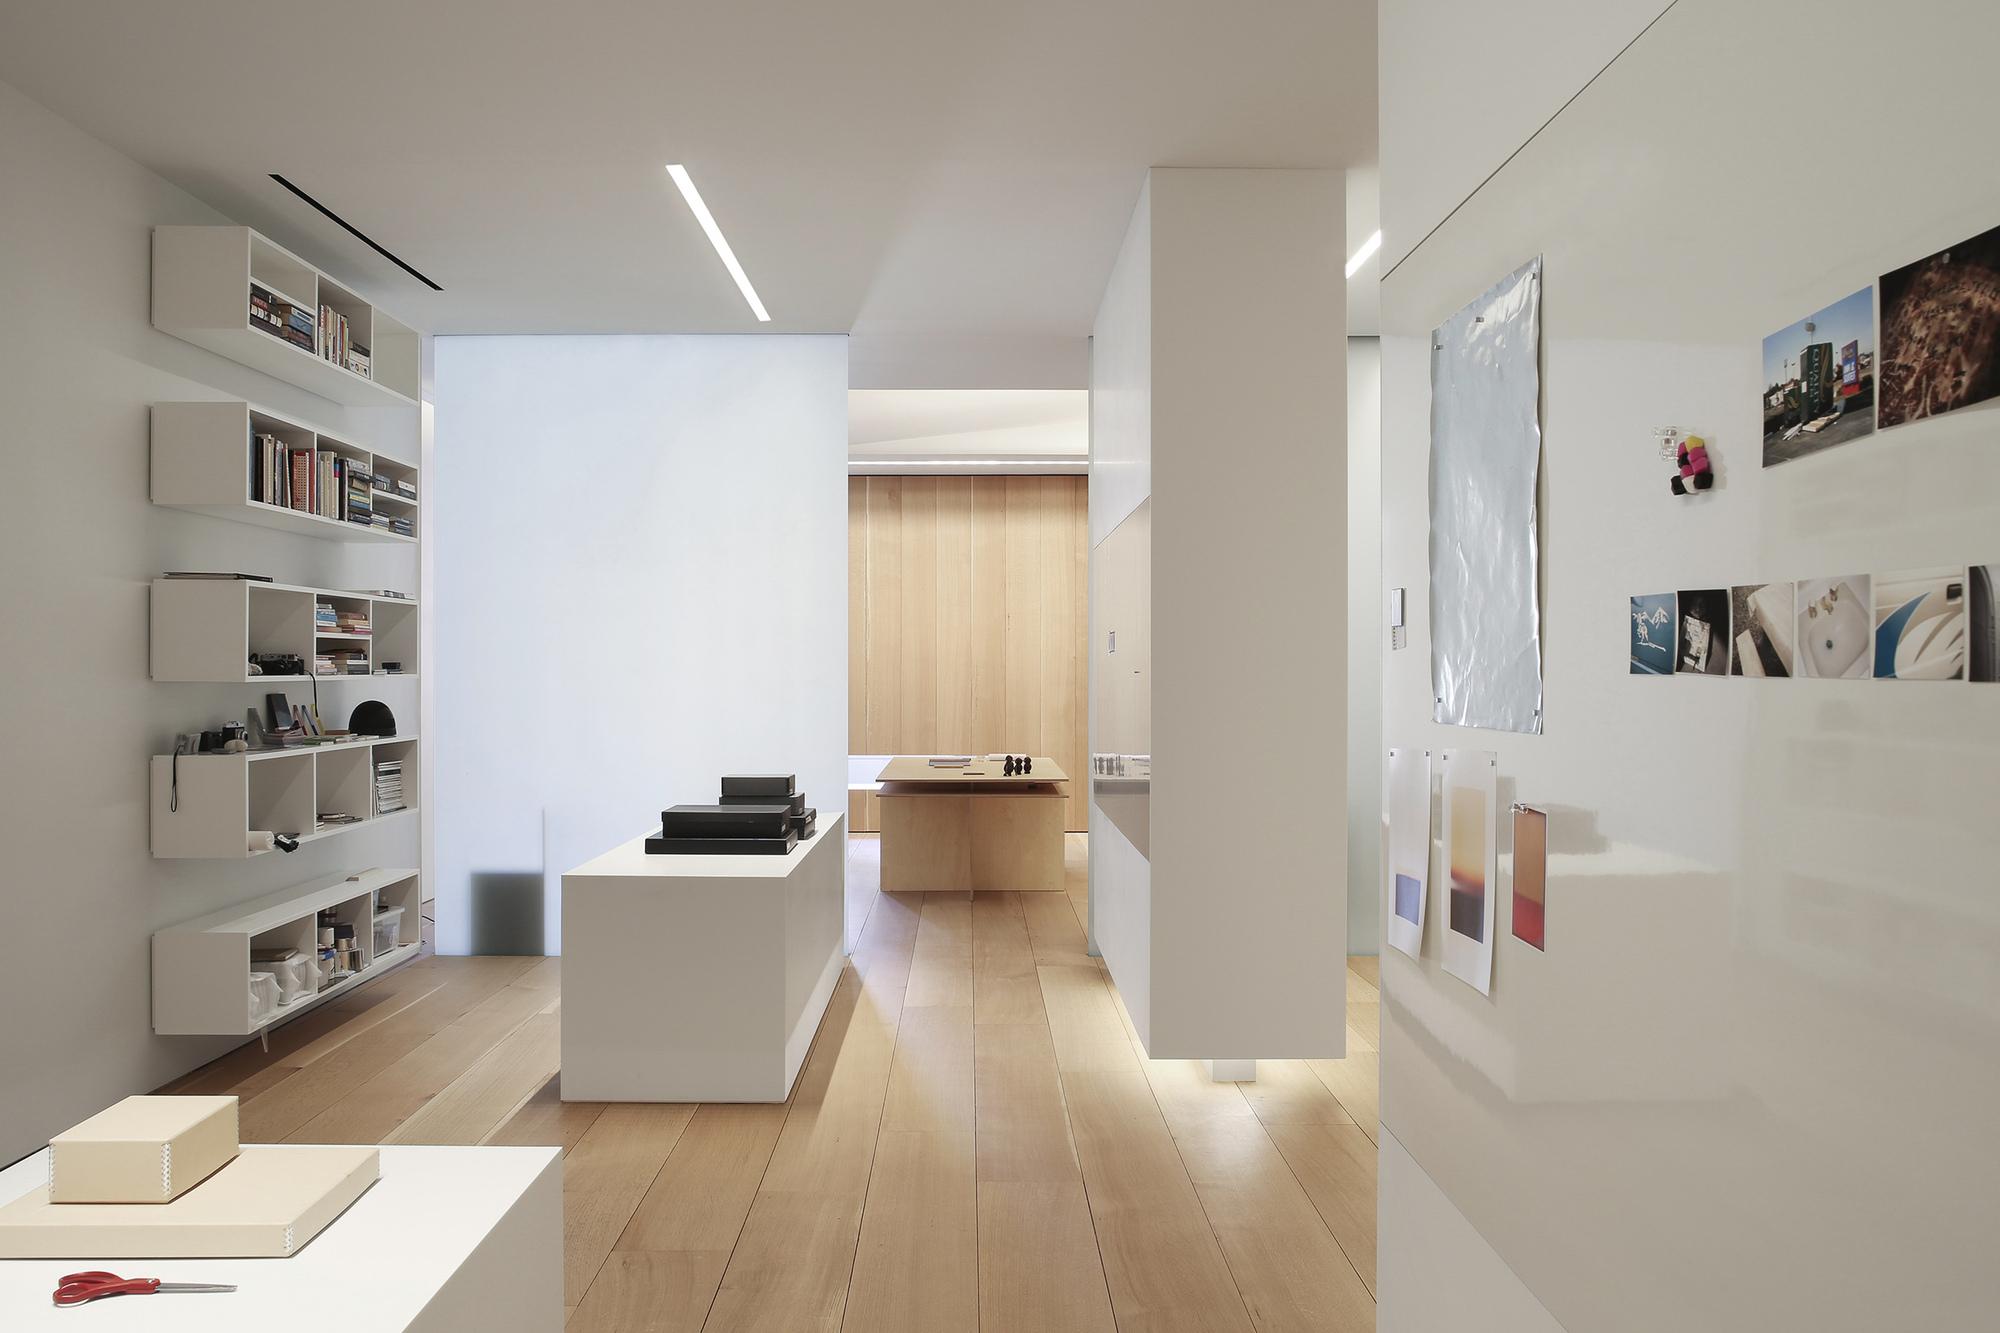 Photographers Loft  Desai Chia Architecture  ArchDaily